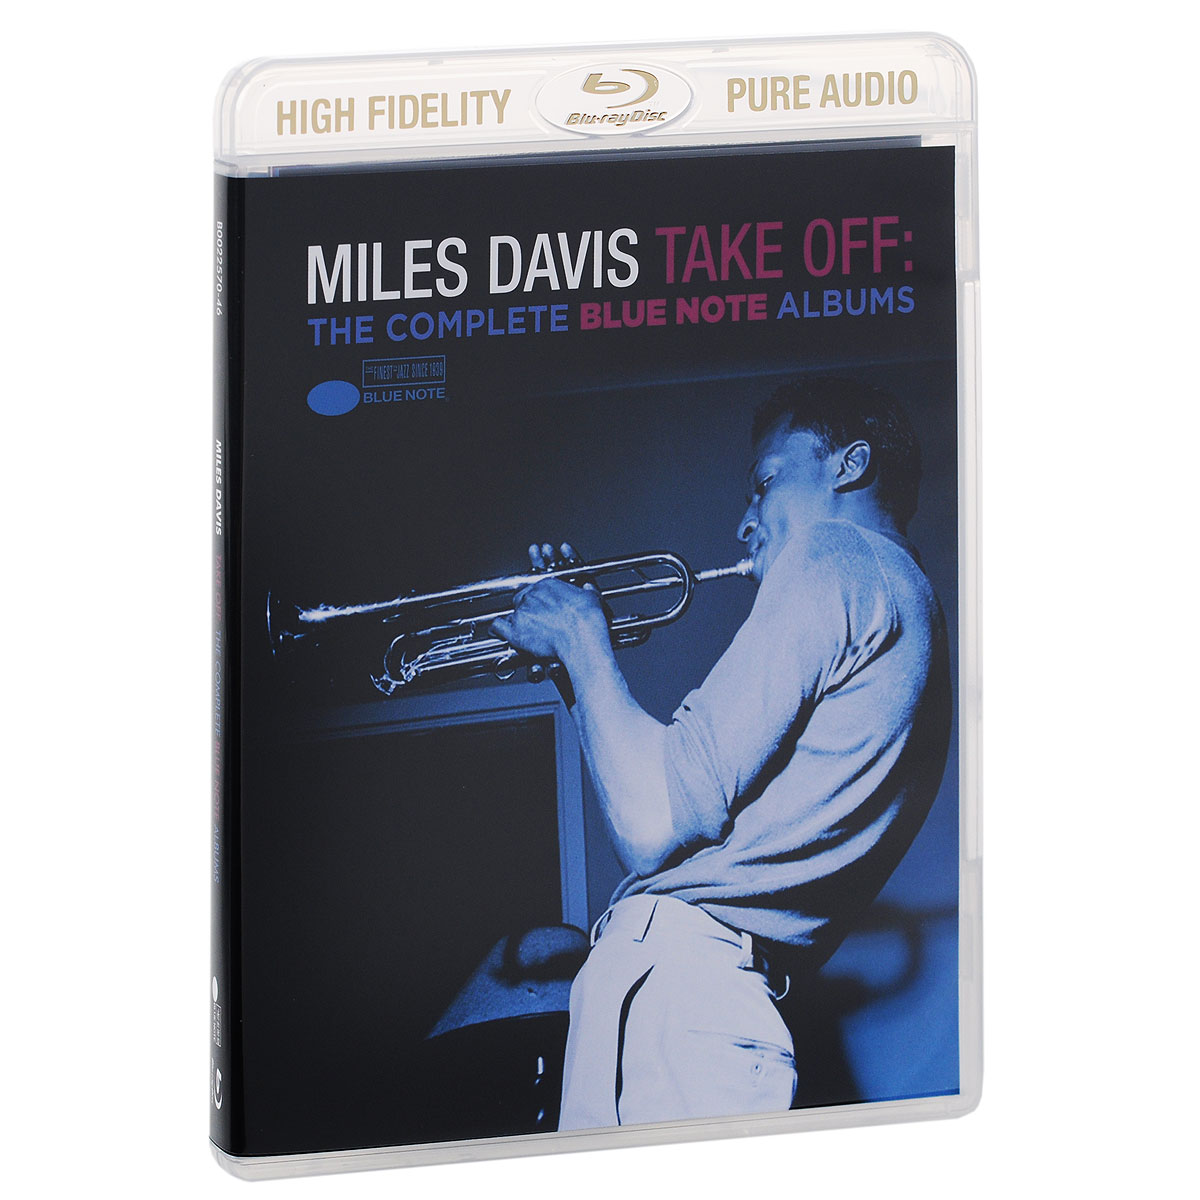 Майлз Дэвис Miles Davis. Take Off. The Complete Blue Note Albums (Blu-ray Audio) prague sinfonia кристиан бенда rossini complete overtures 2 blu ray audio